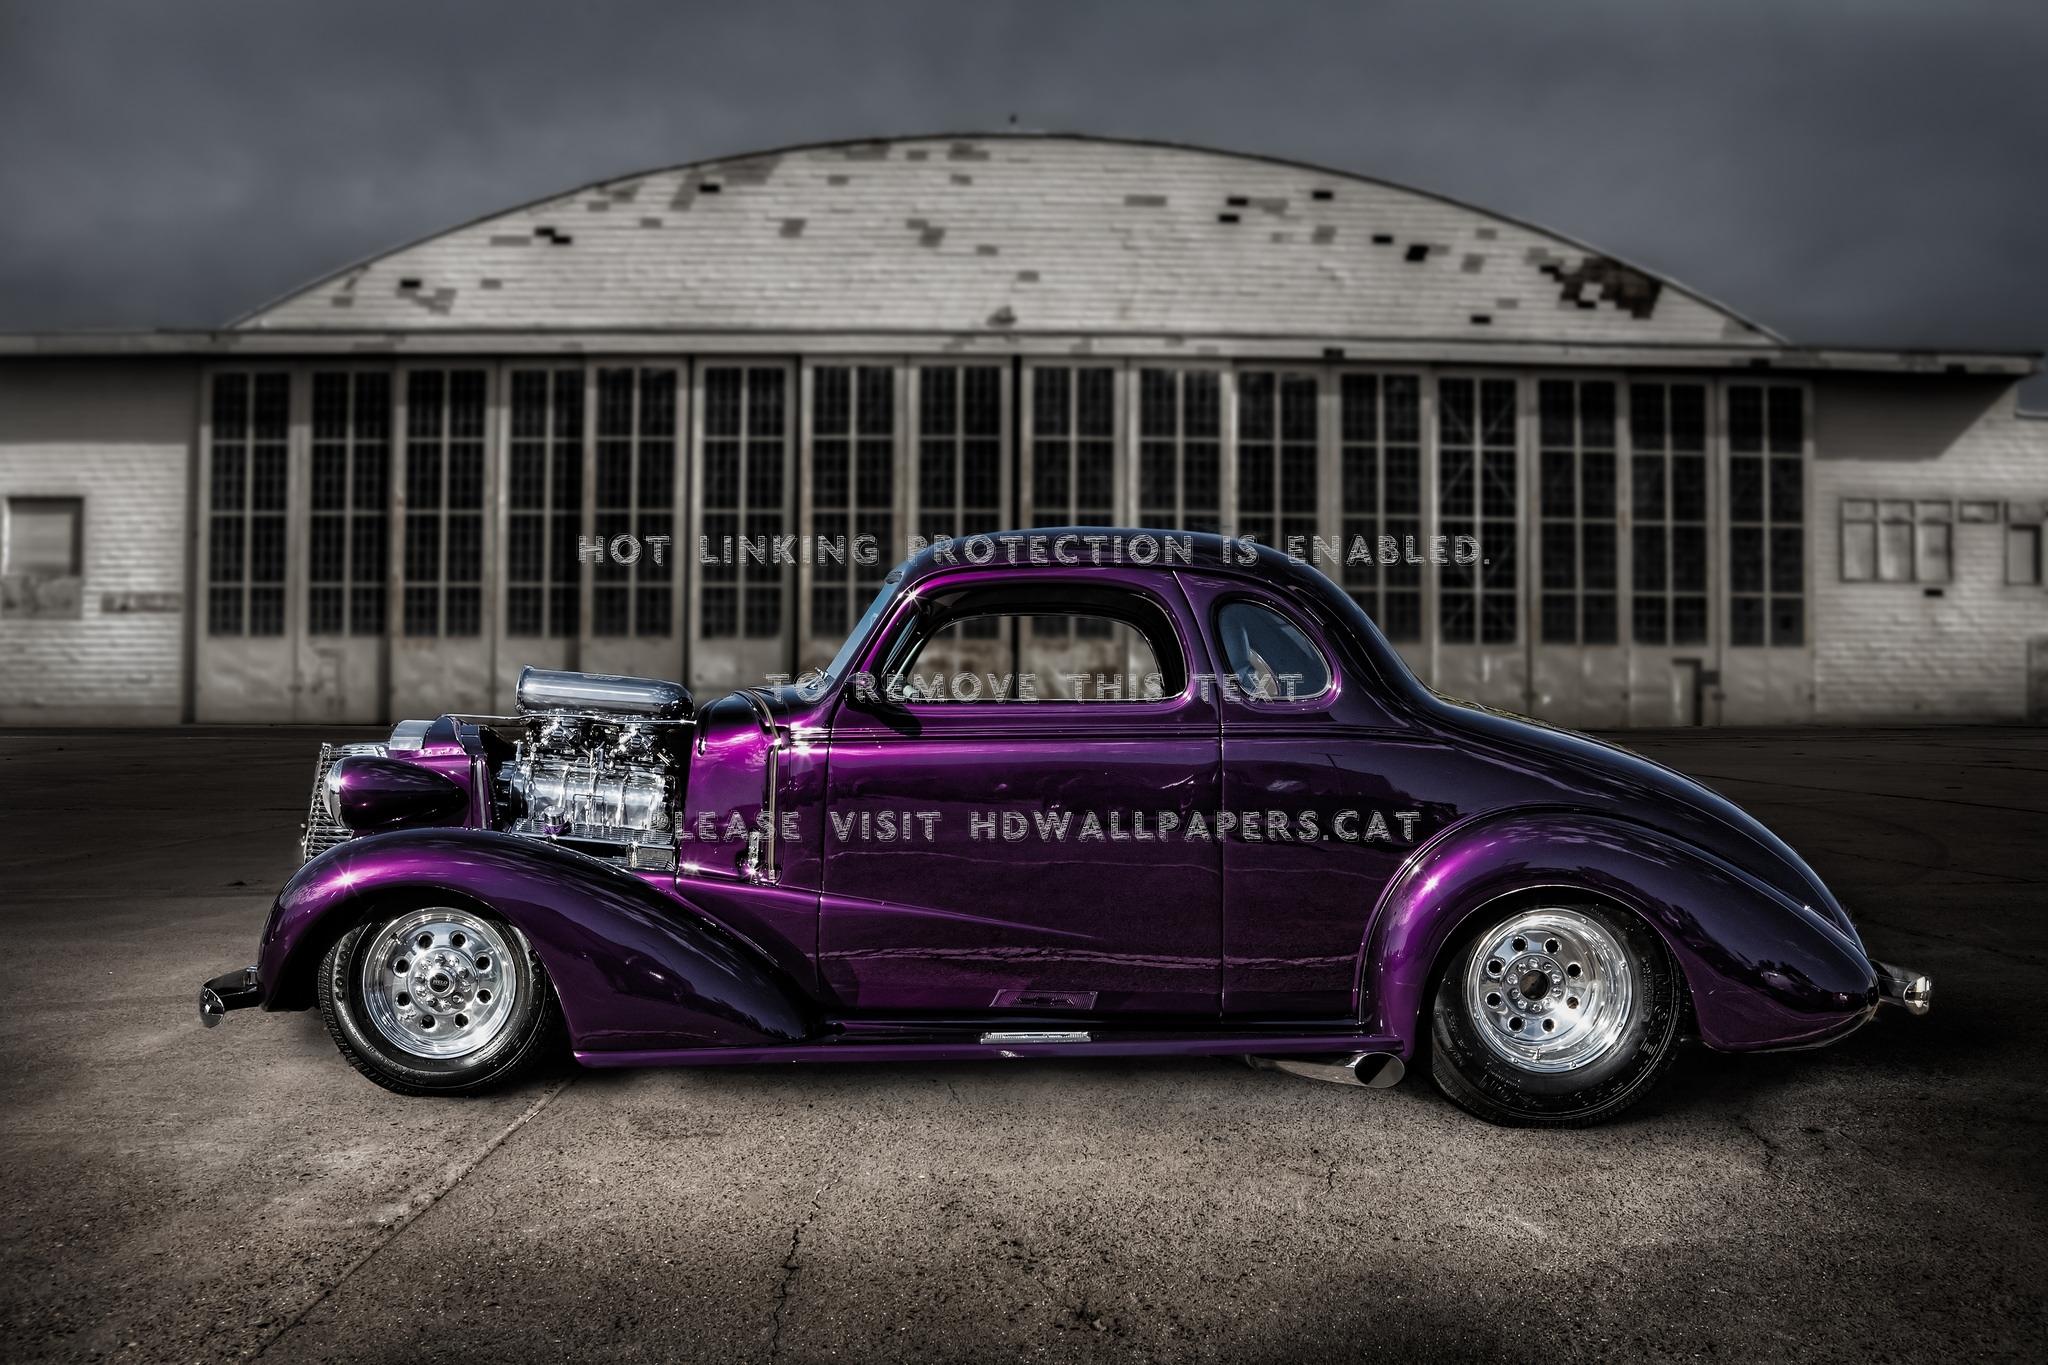 Purple Haze Car Hot Rod Street Ford - Color Violeta Hot Rod - HD Wallpaper